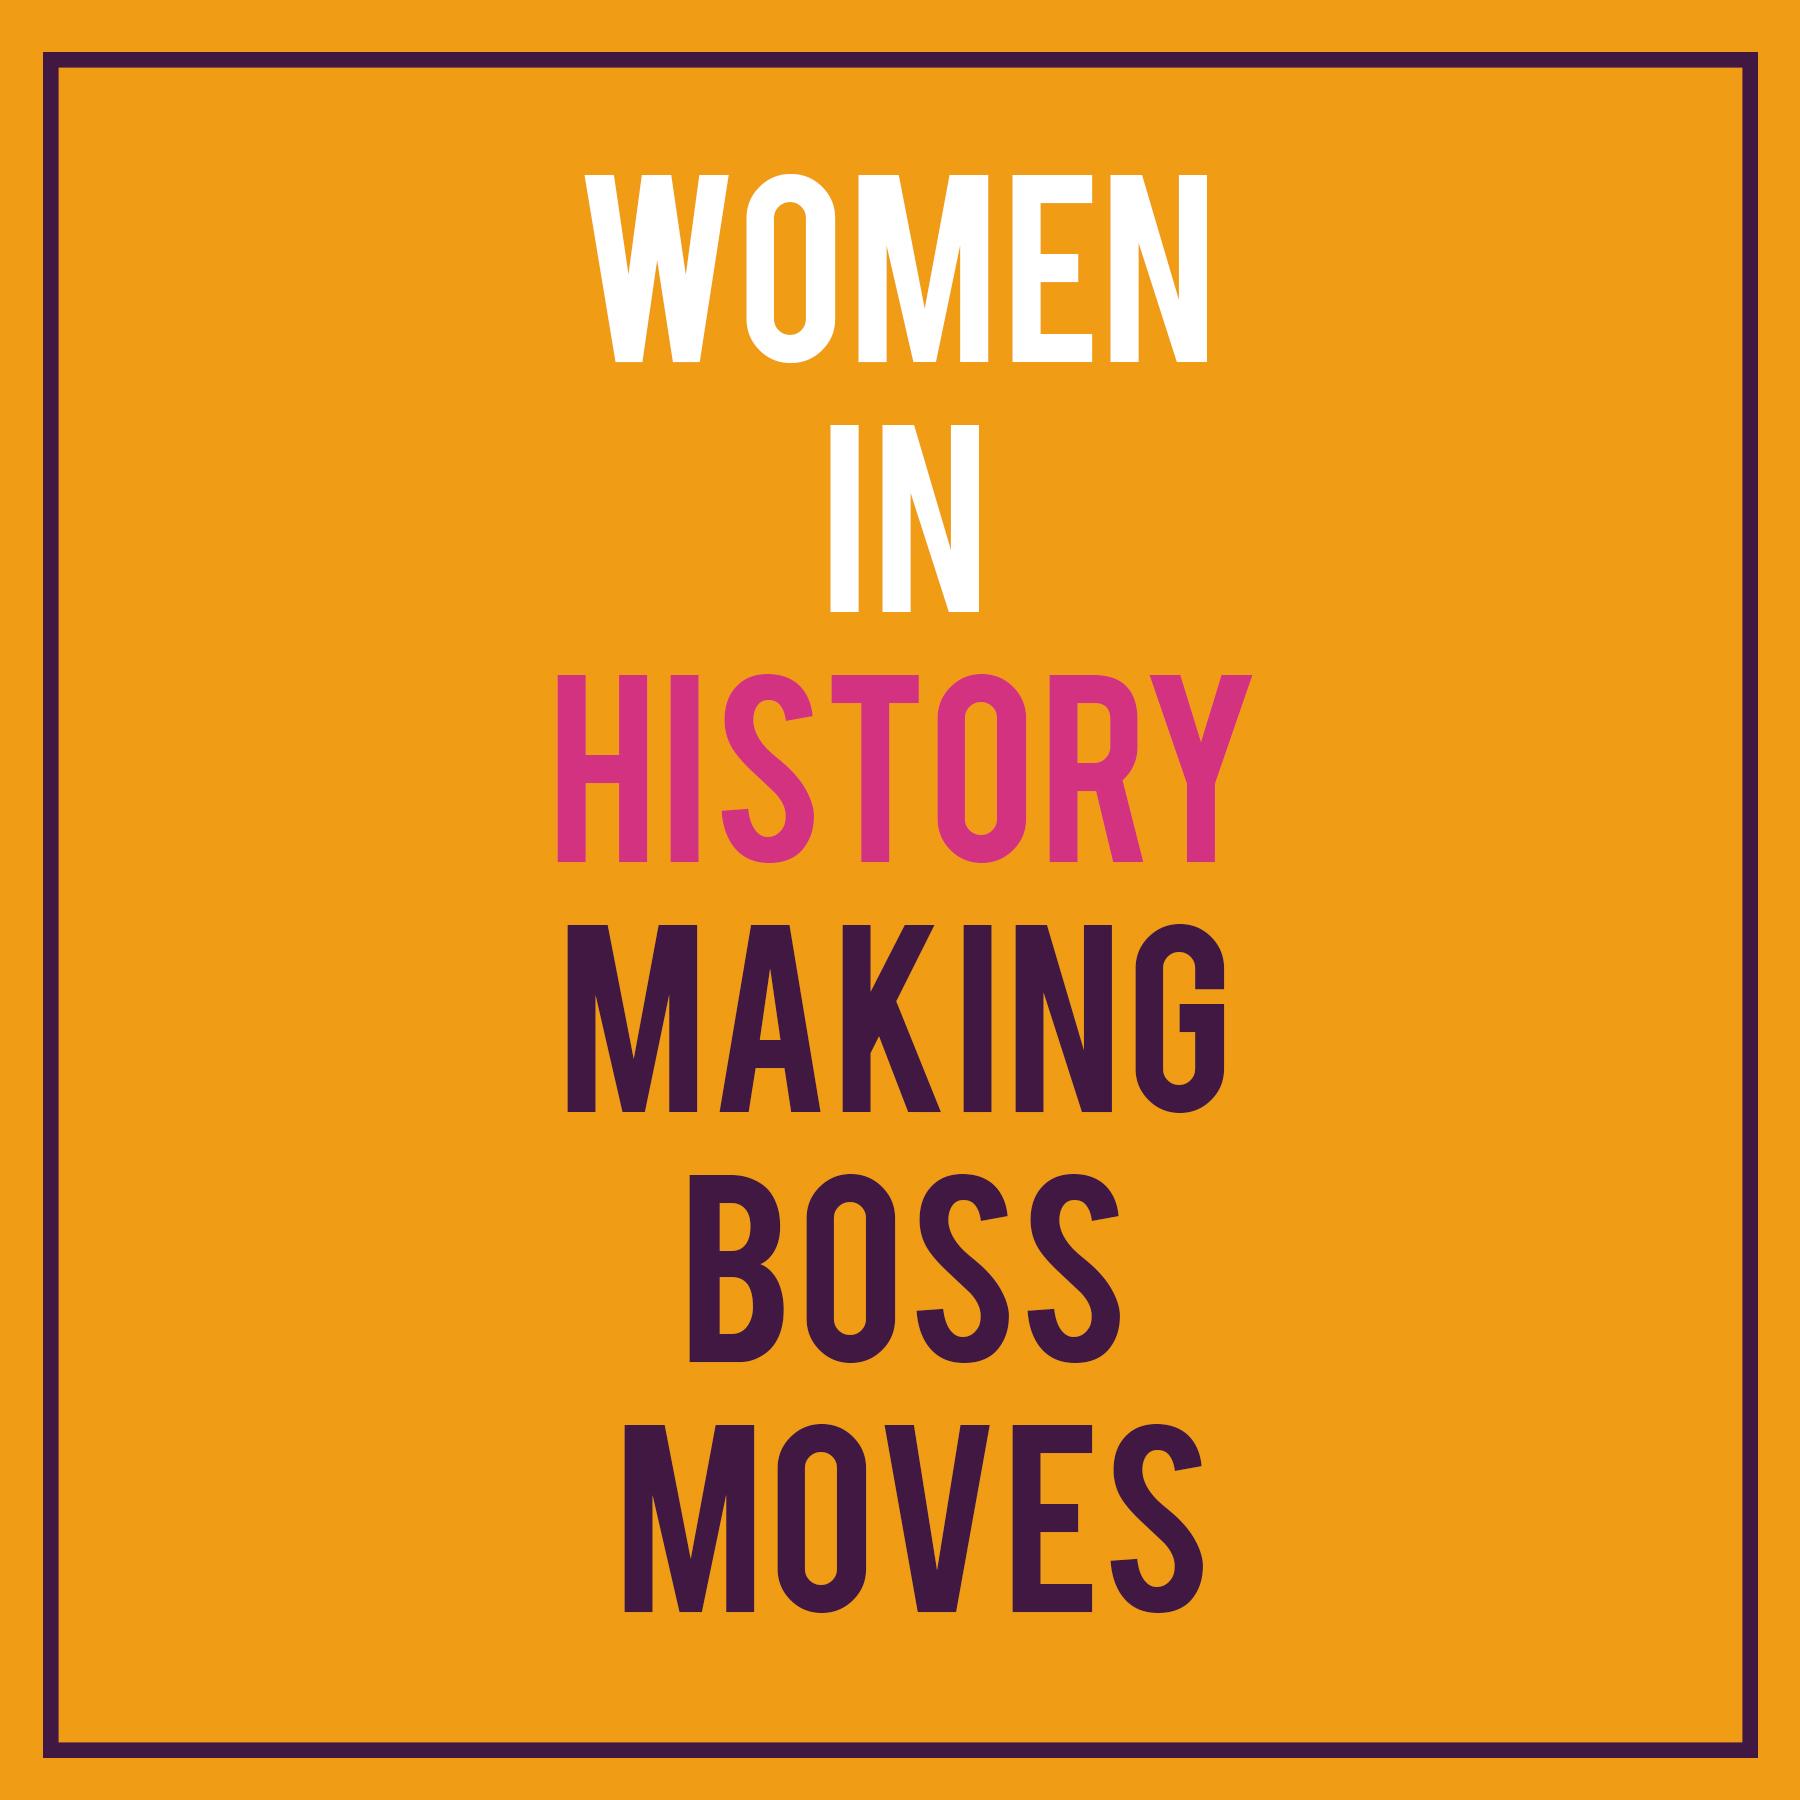 Women in History Making Boss Moves